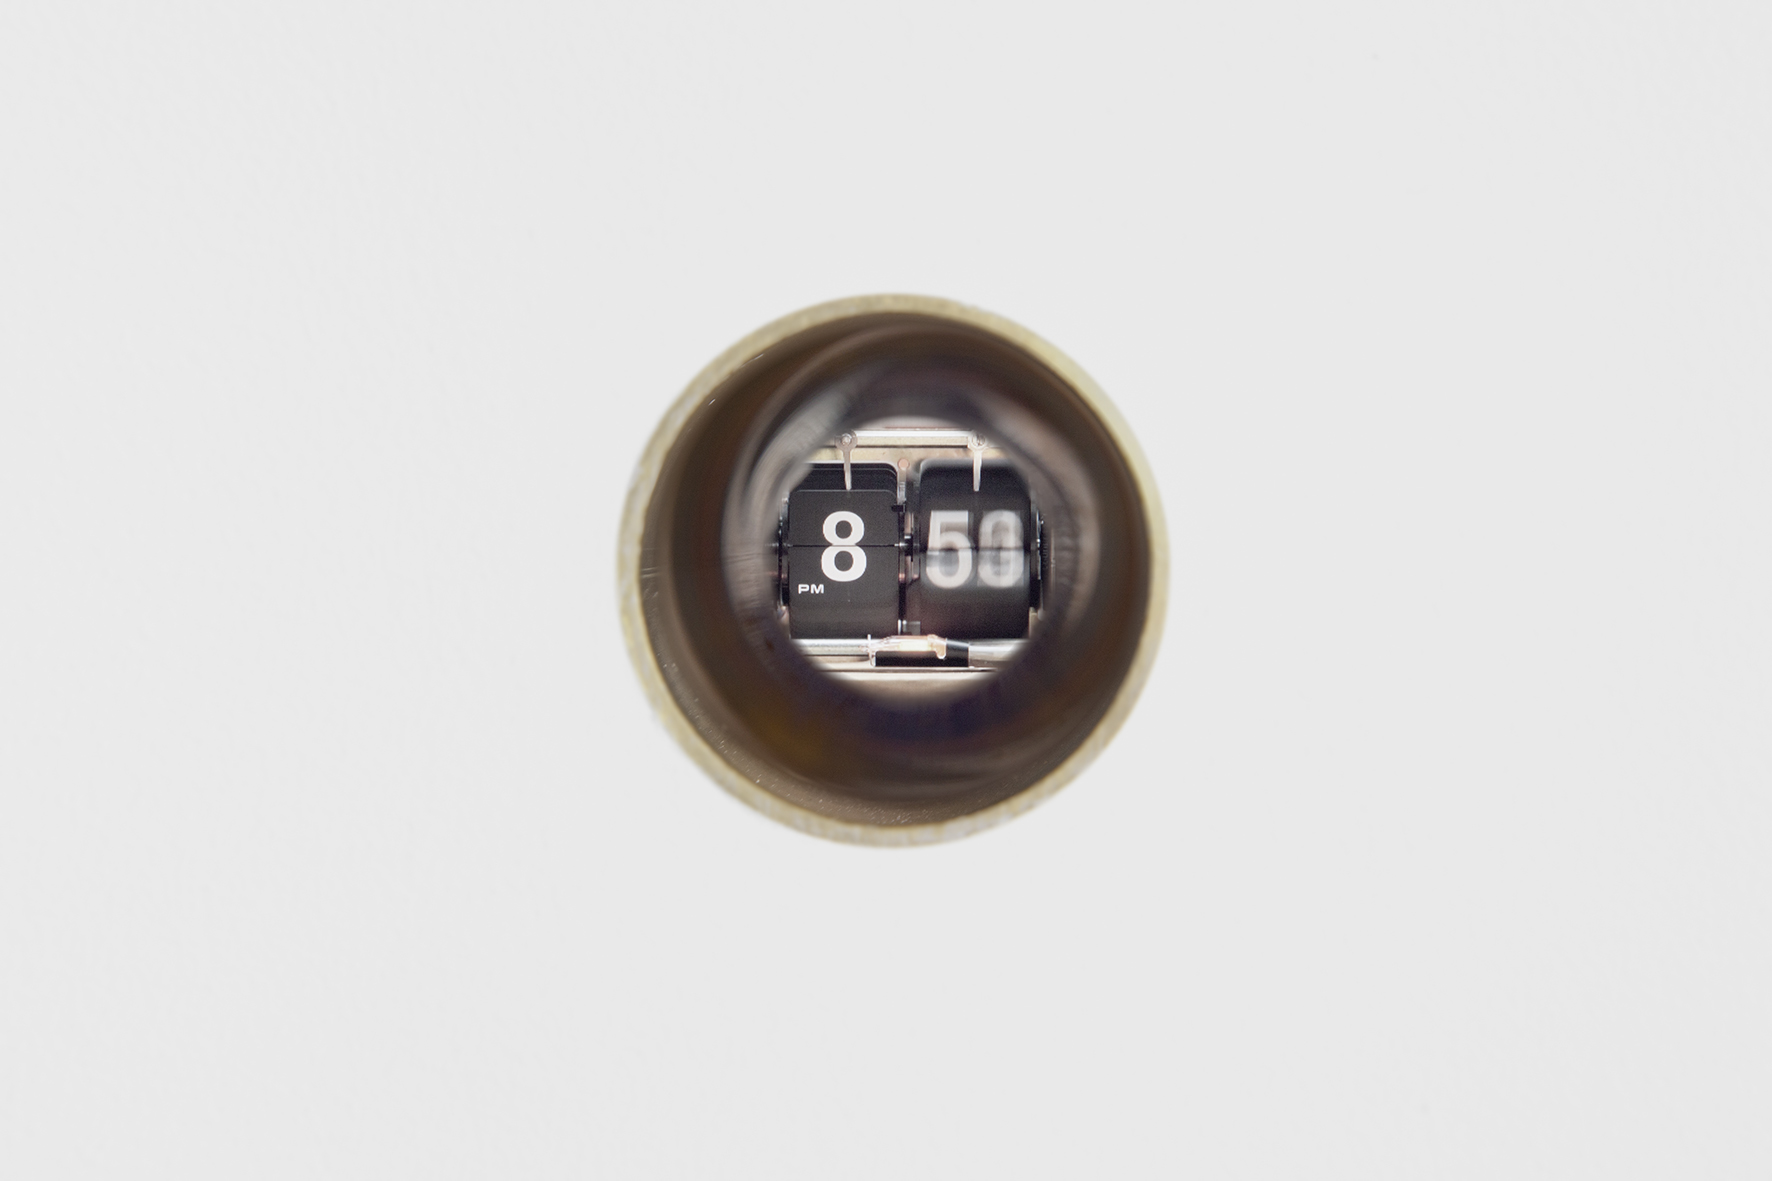 MH_Momentary_peepholevideo3_sm.jpg